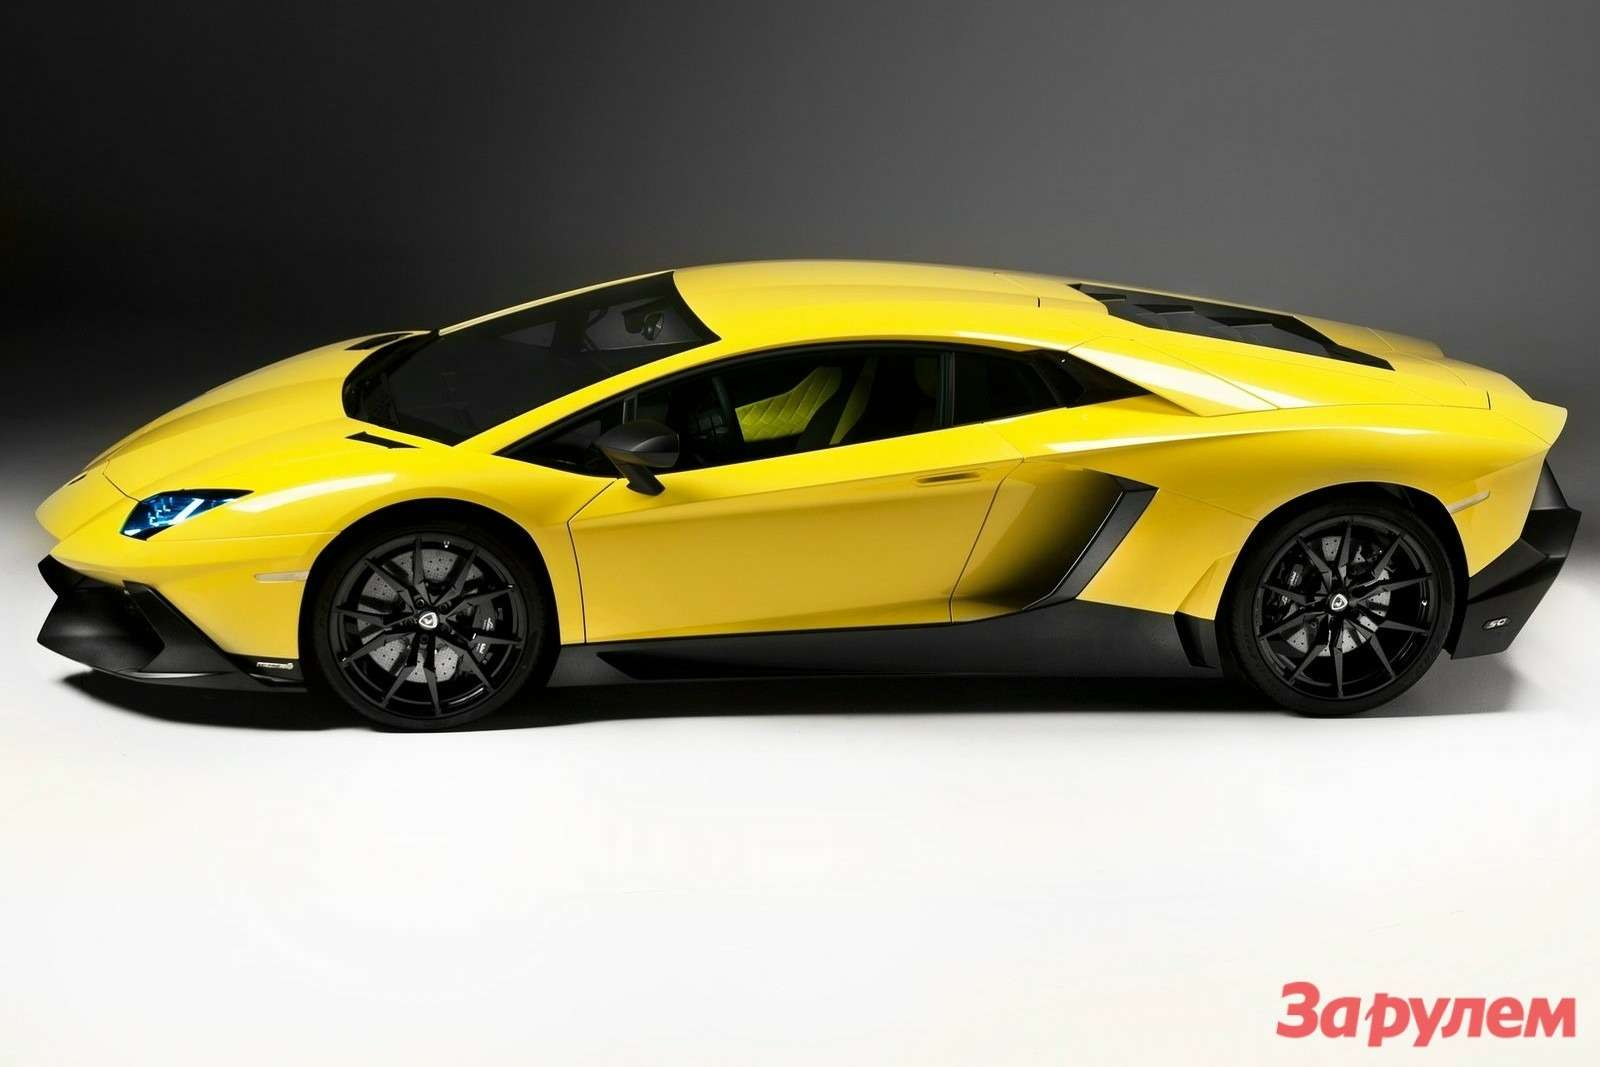 Lamborghini Aventador LP7204 50th Anniversary 2013 1600x1200 wallpaper 02